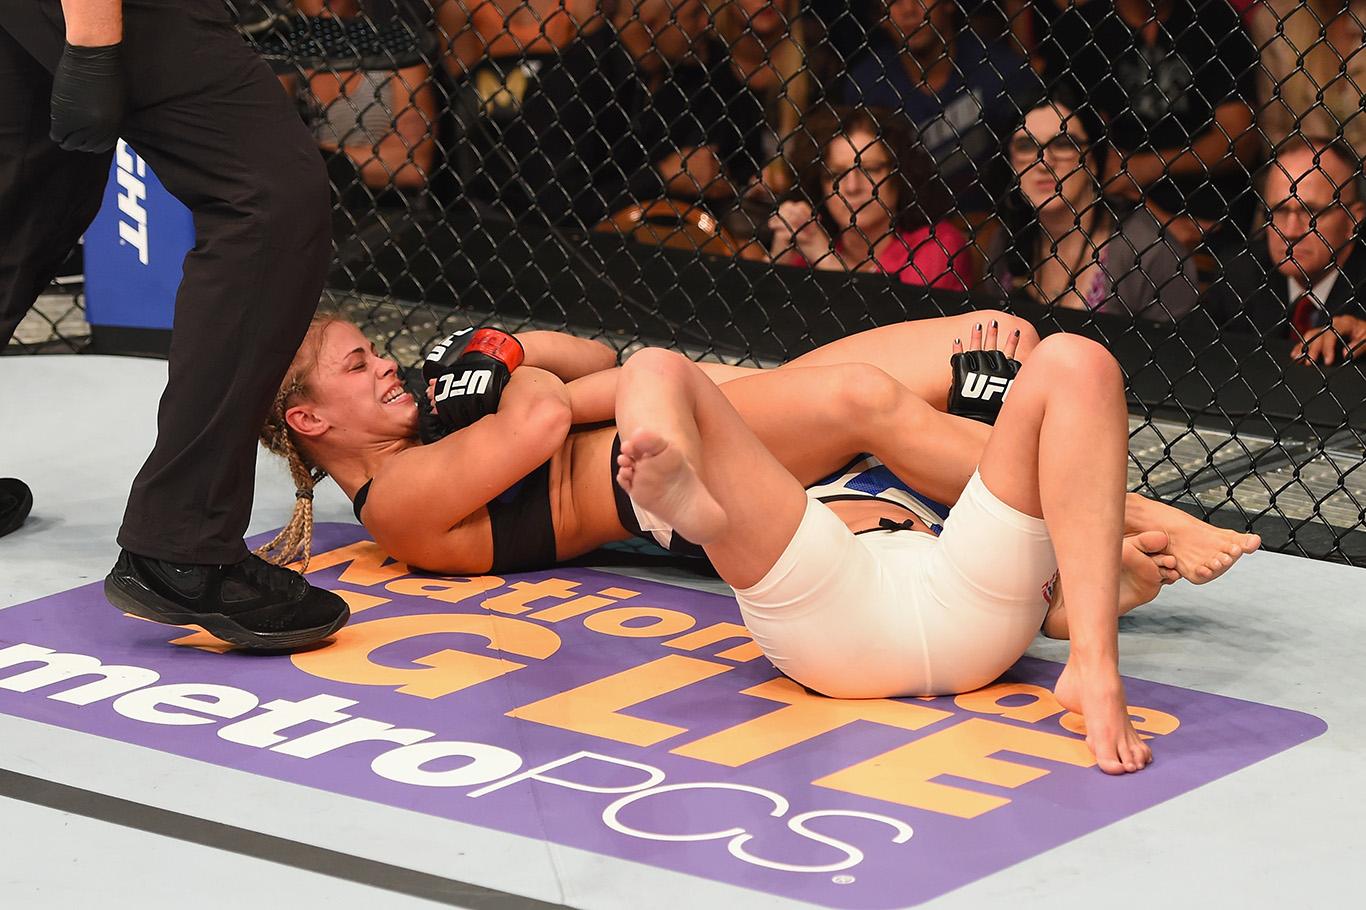 UFC 191: VanZant vs Chambers